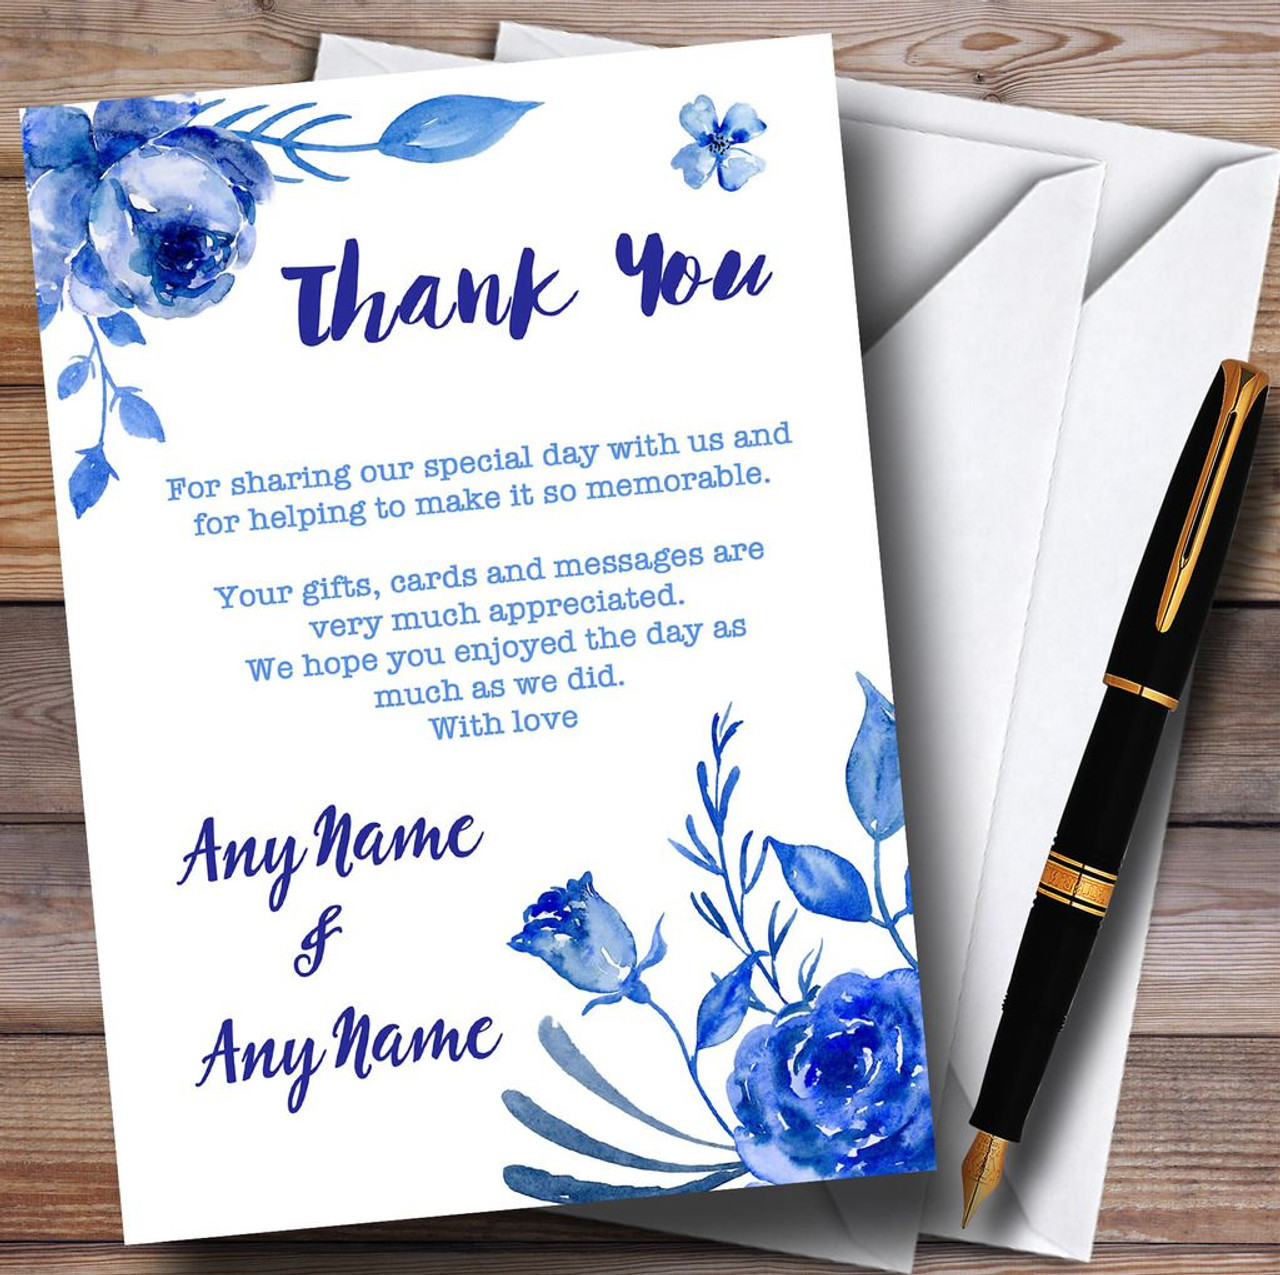 Personalised Vintage Wedding Wish Poem Card Fantasy Floral Blue on Chalkboard